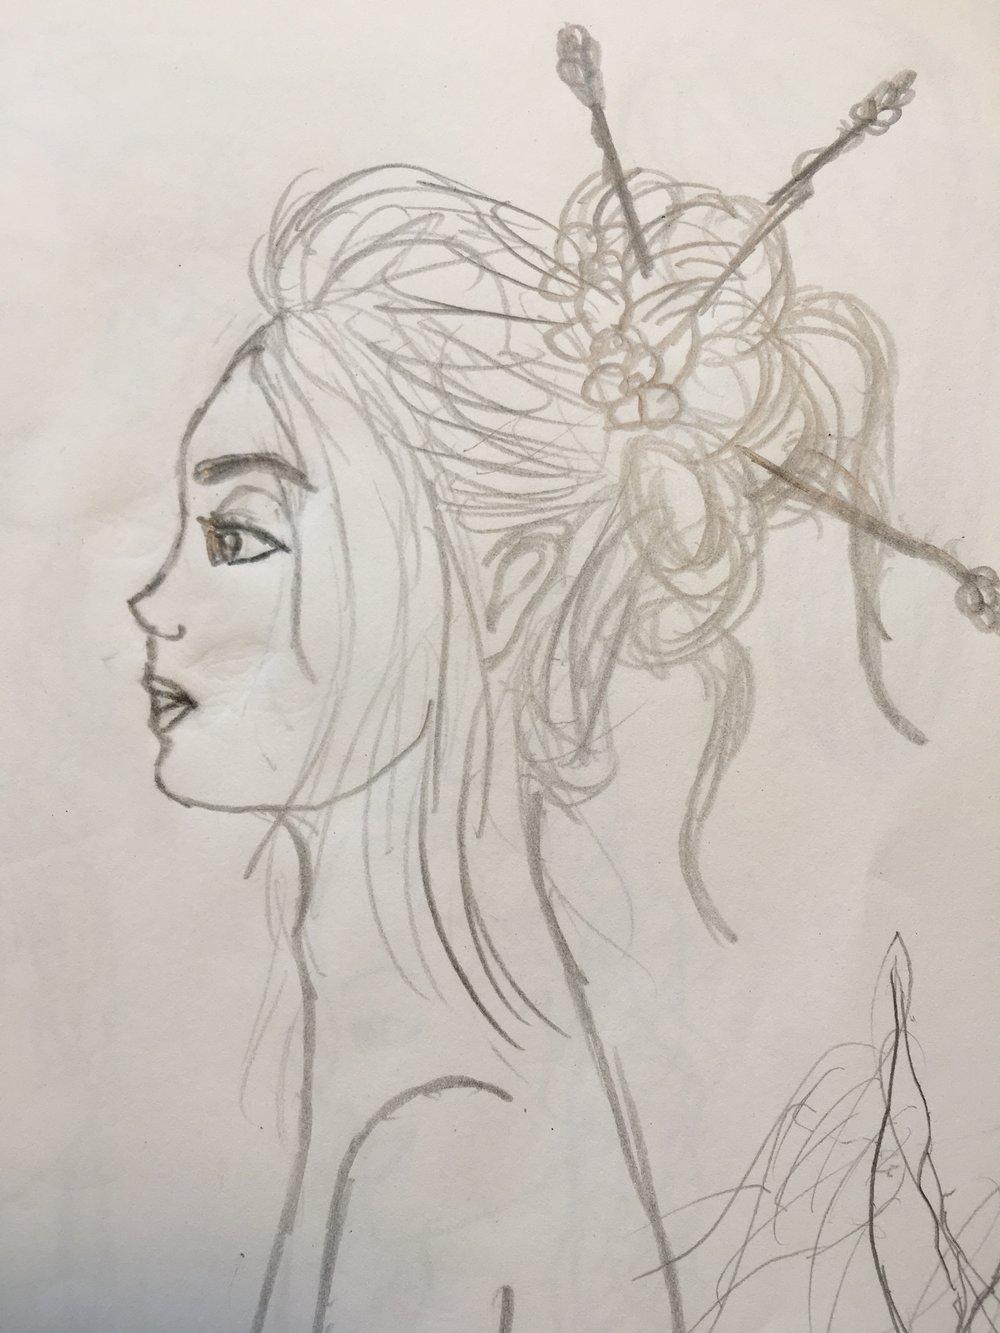 Woman (Pencil)